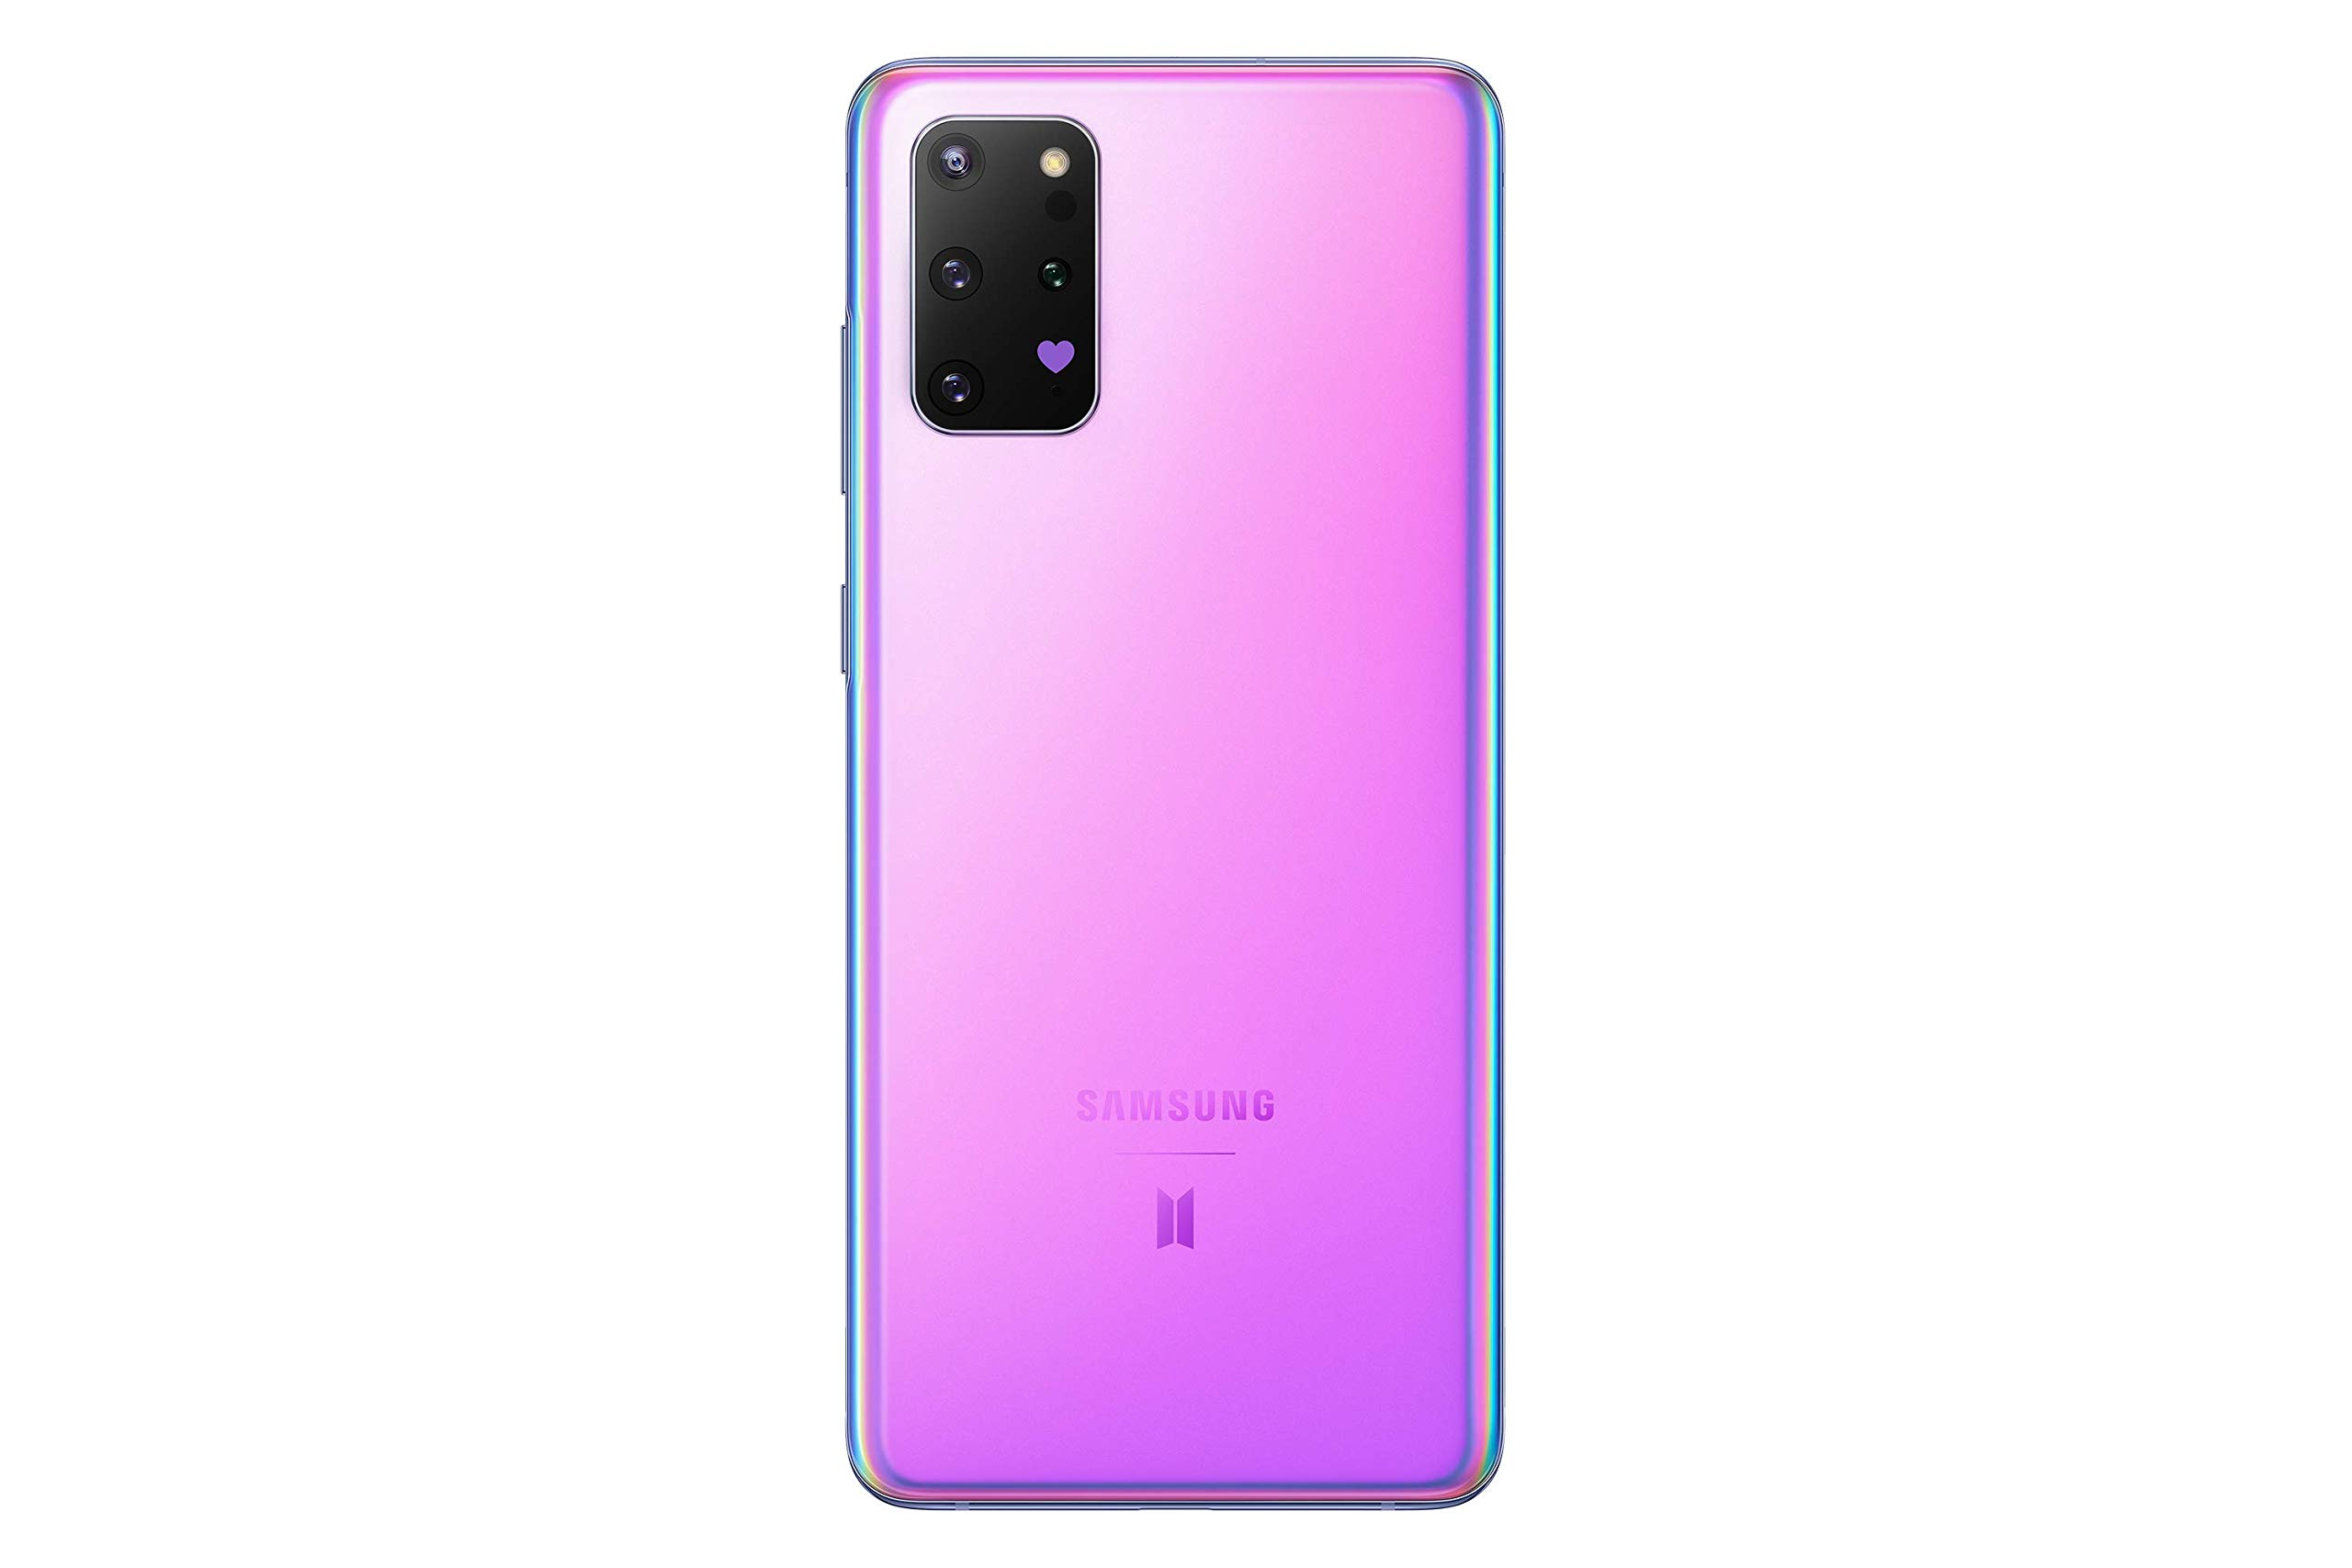 Samsung Galaxy S20 Plus Bts Edition Dual Sim 128 Gb 12 Gb Ram 5g Purple Buy Online At Best Price In Ksa Souq Is Now Amazon Sa